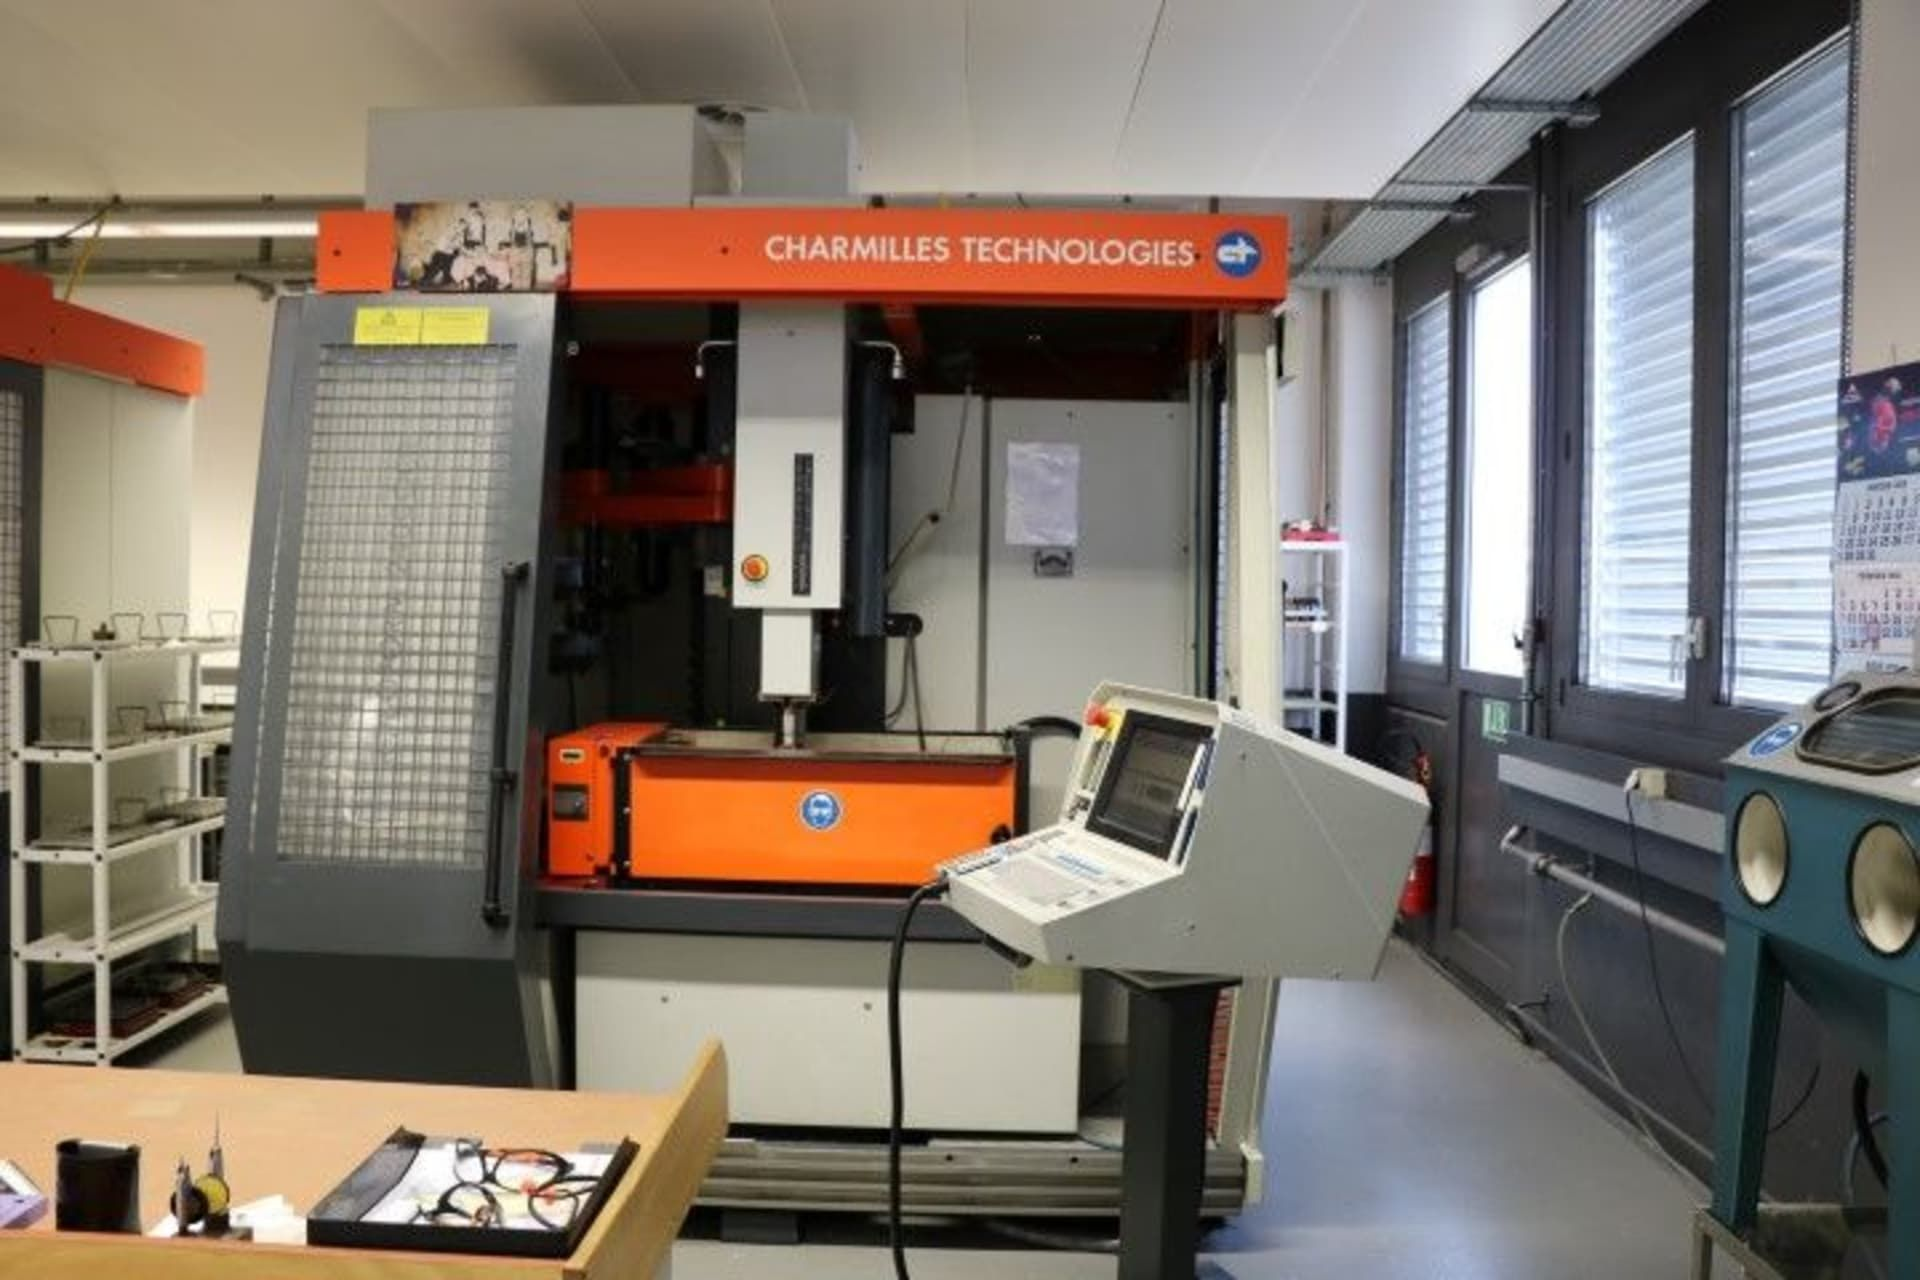 CHARMILLES ROBOFORM 2400 Senkerodiermaschine